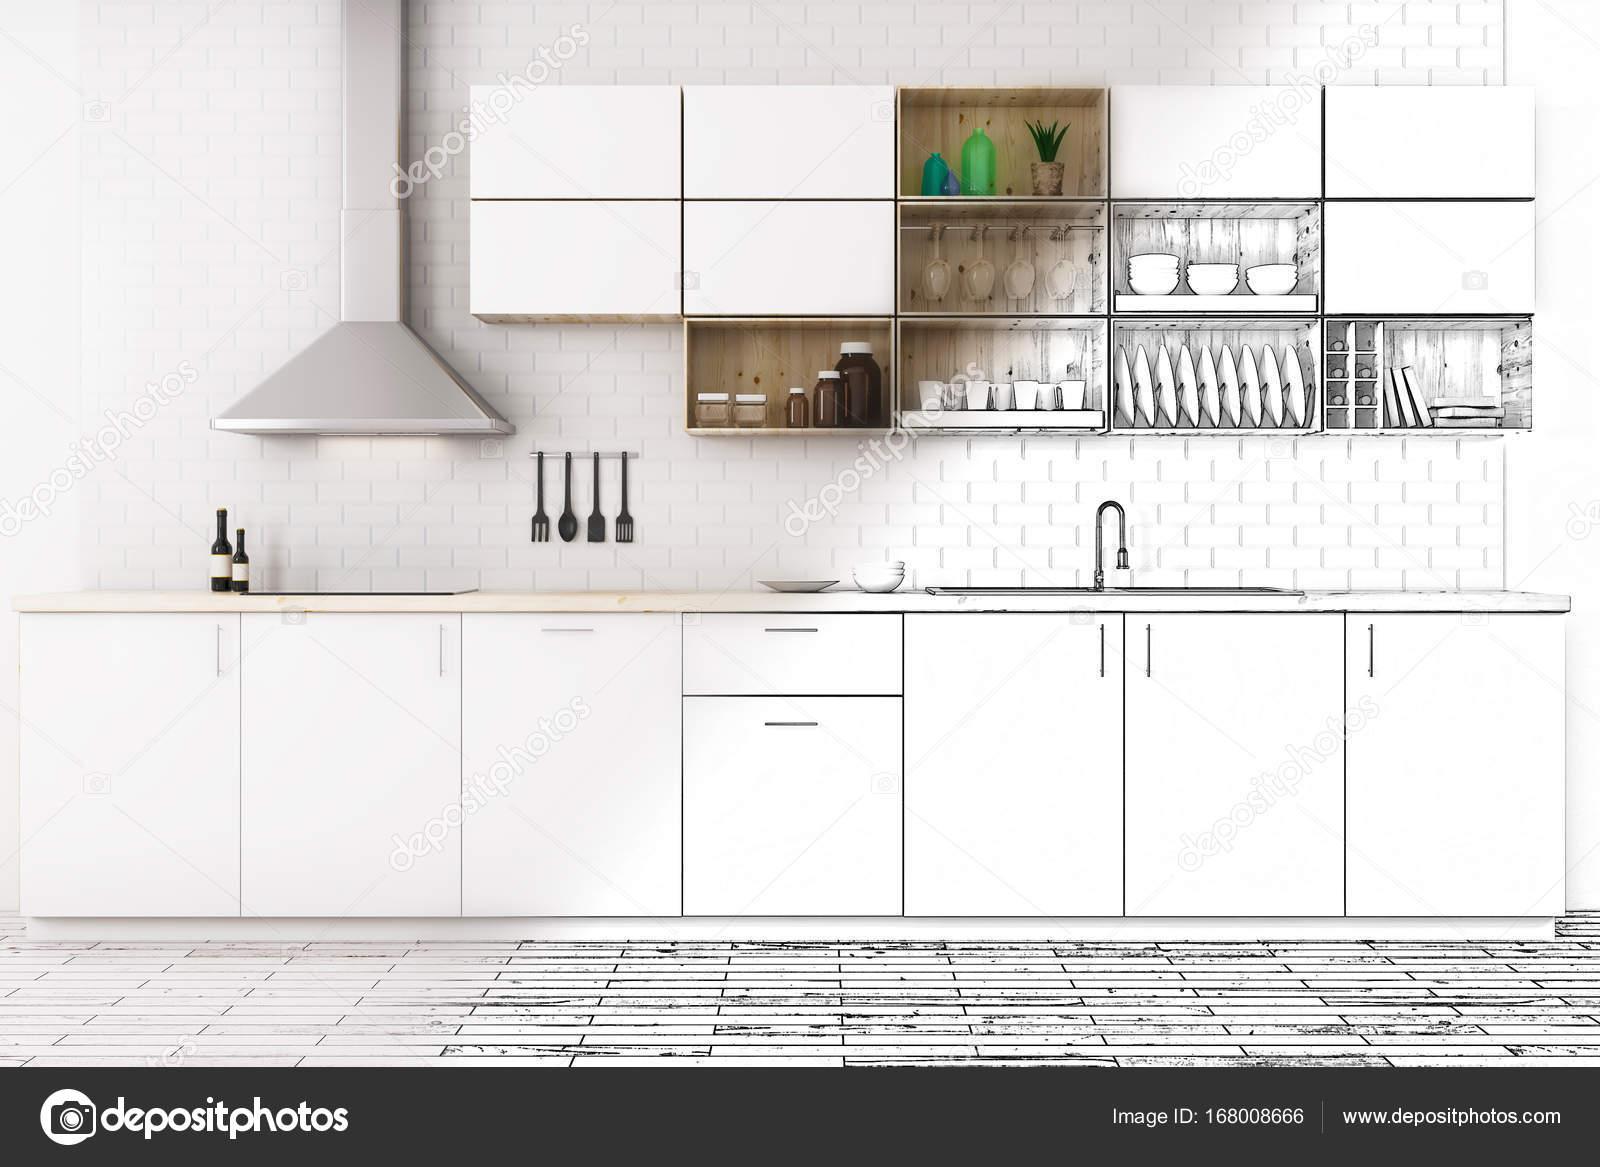 Unvollendete Moderne Kuche Interieur Skizze Architektur Konzept 3D Rendering Foto Von Peshkova